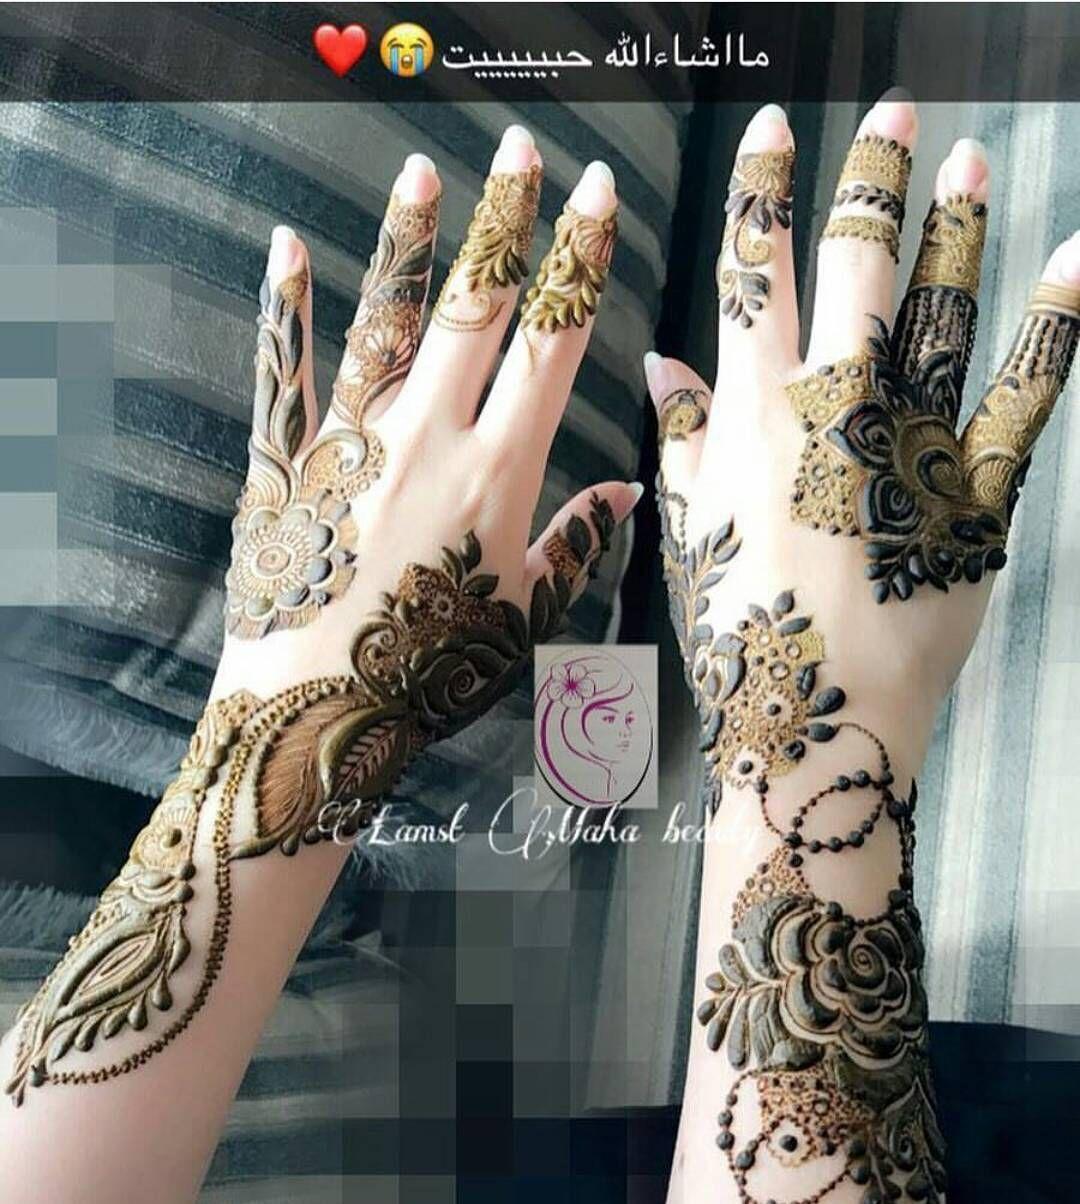 Mahaalajmi888 الله یسعد من حط لایک اكتبي اسم من اسماء الله الحسنى لعل الله يفرج به همك Dulhan Mehndi Designs Latest Mehndi Designs Full Mehndi Designs